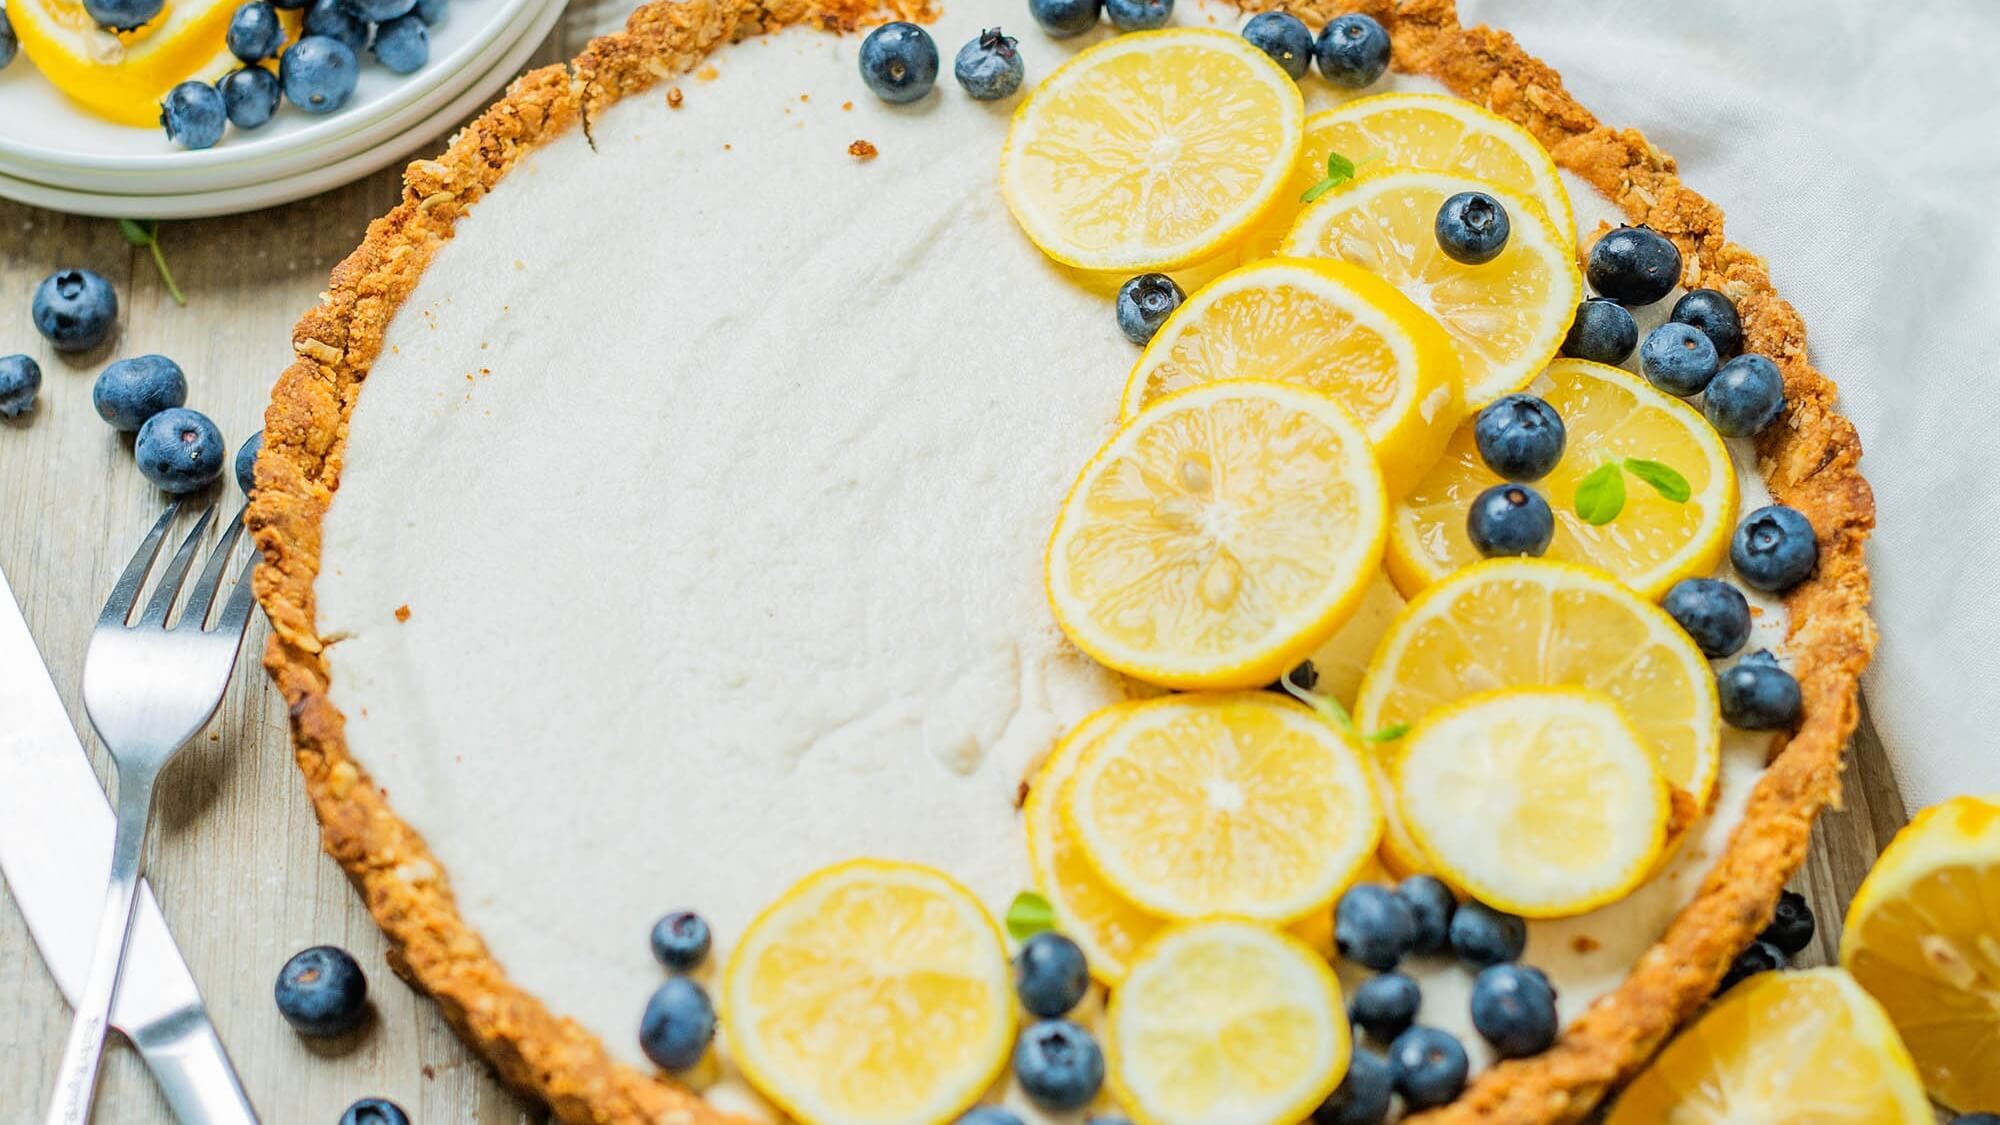 Lemony Vegan Summer Tart With Dairy-Free Coconut Cream